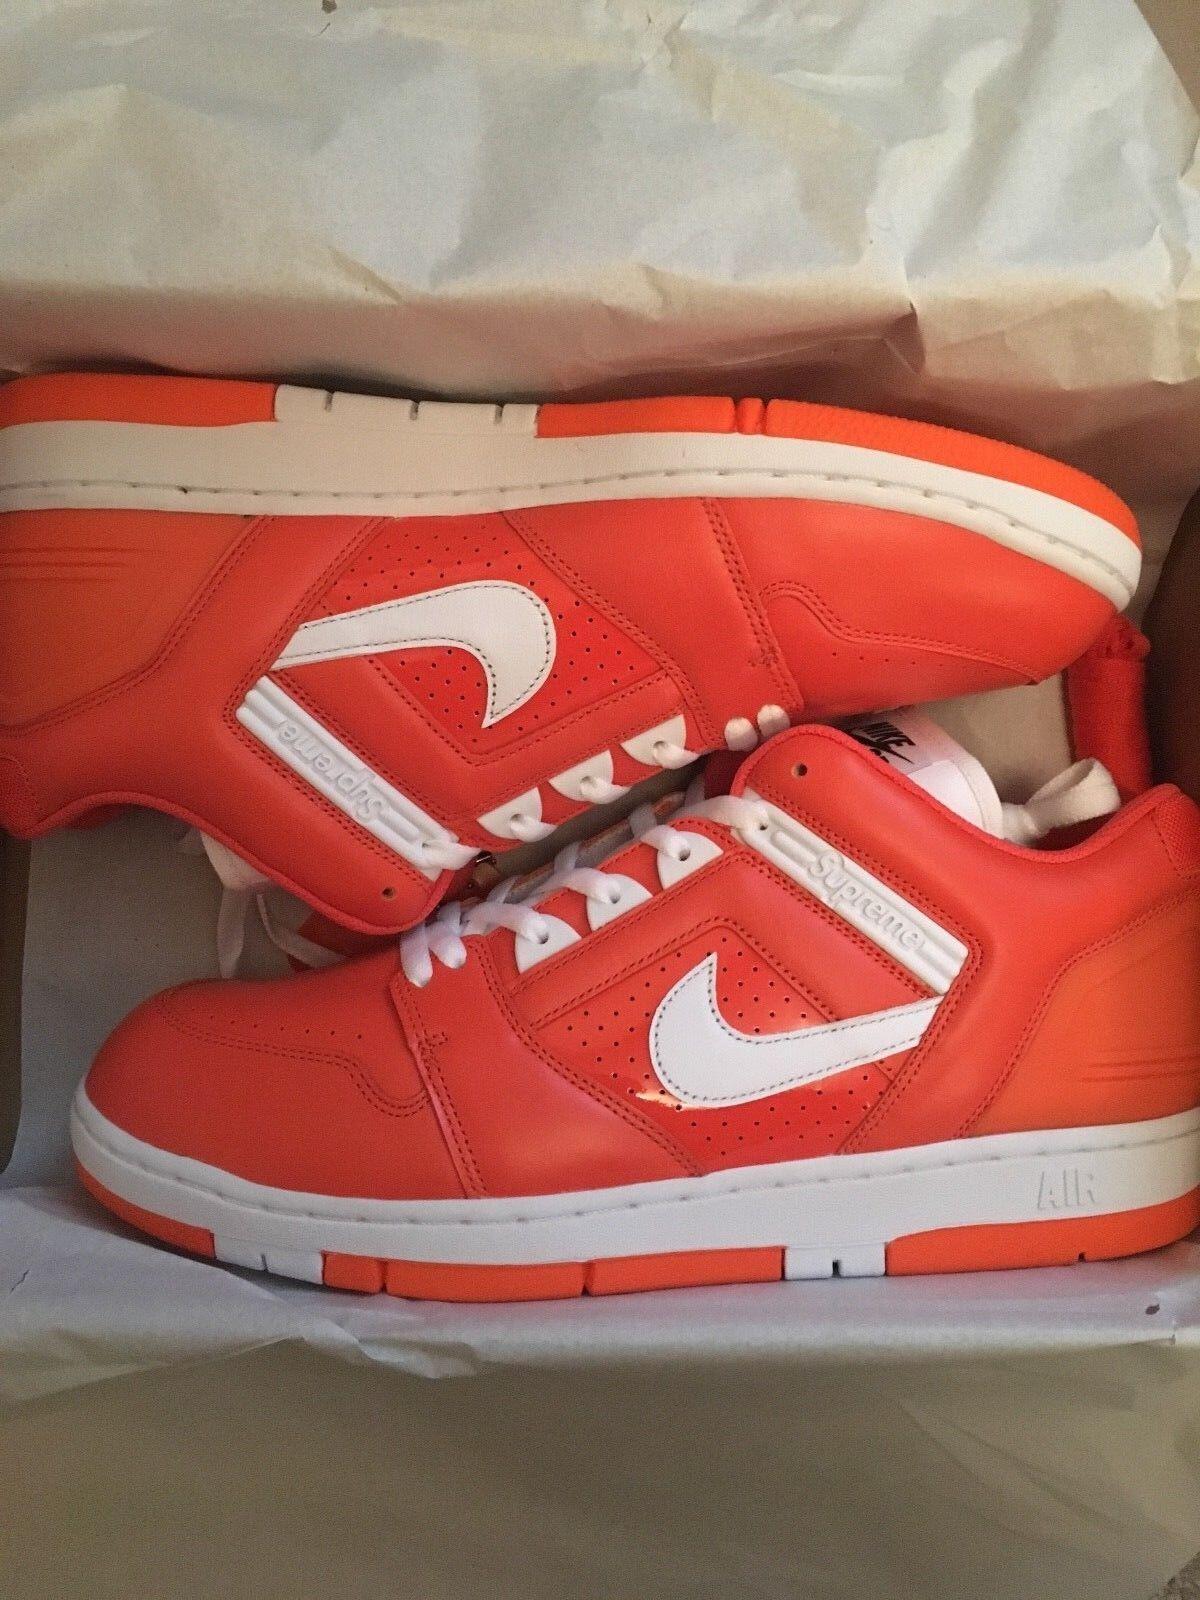 3 Pairs Of Supreme Air Force 2  Teal + orange + Brown UK12